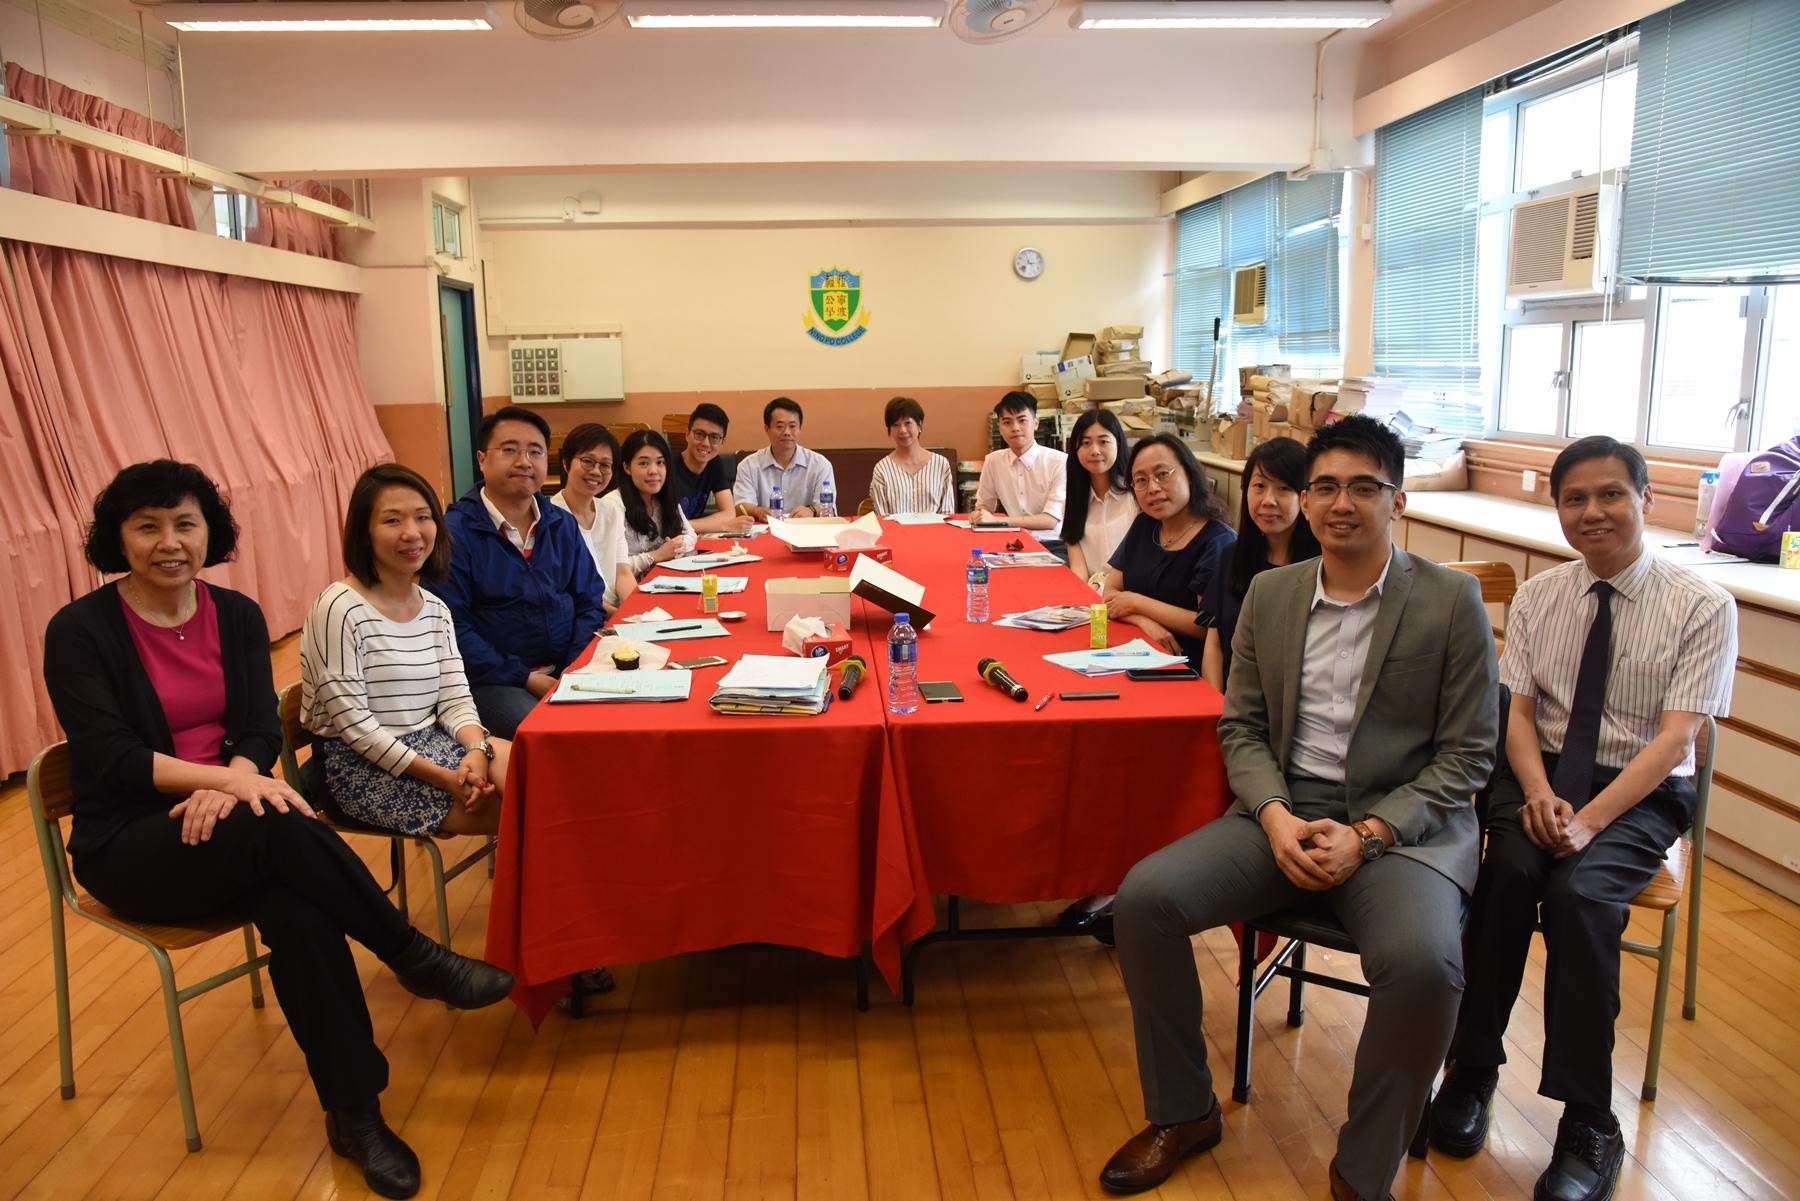 http://npc.edu.hk/sites/default/files/dsc_0302.jpg